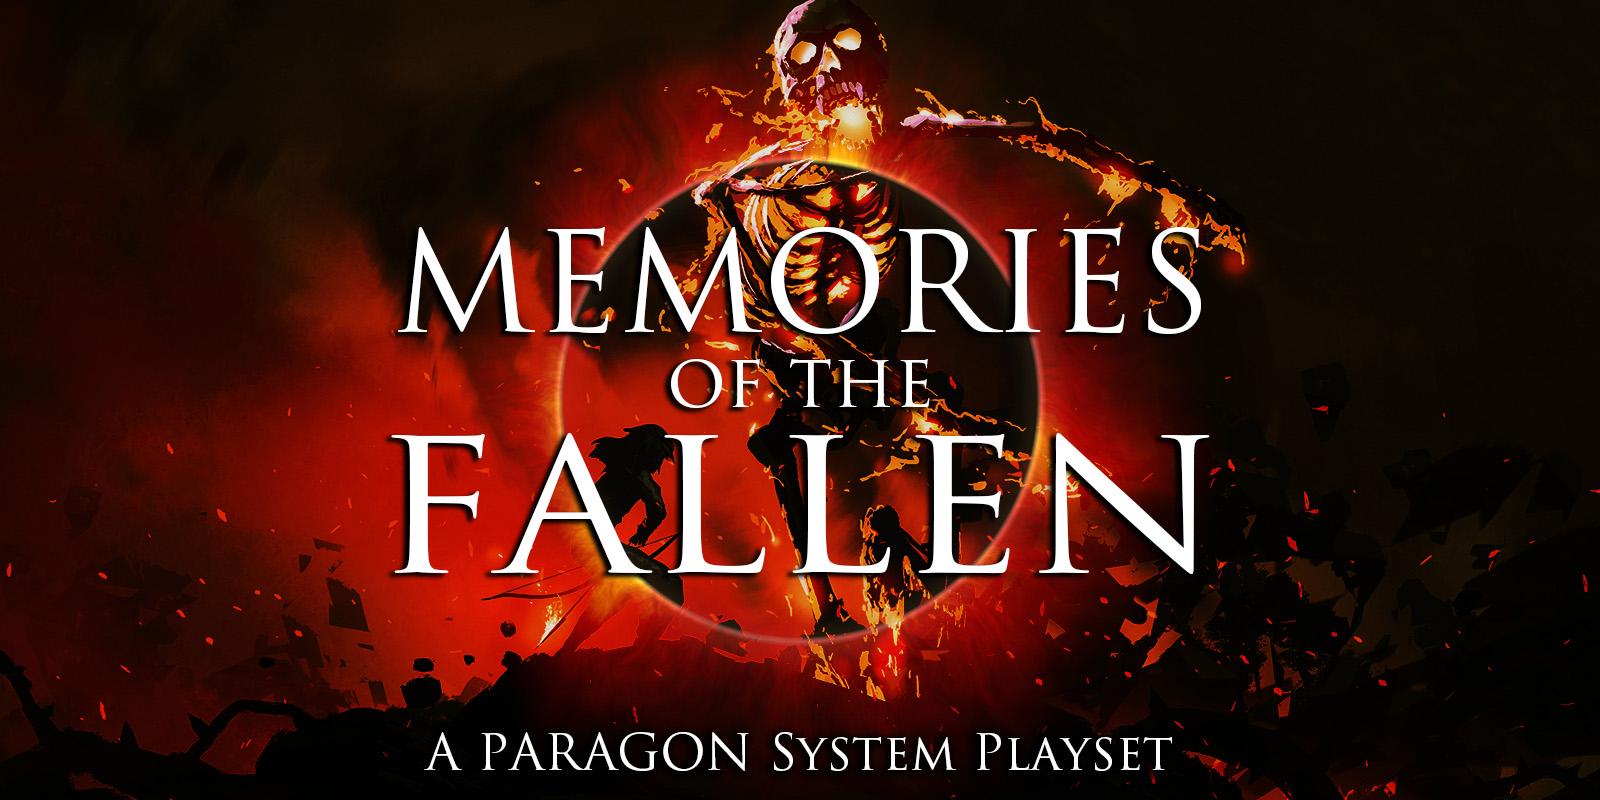 Memories of the Fallen: AGON Playset